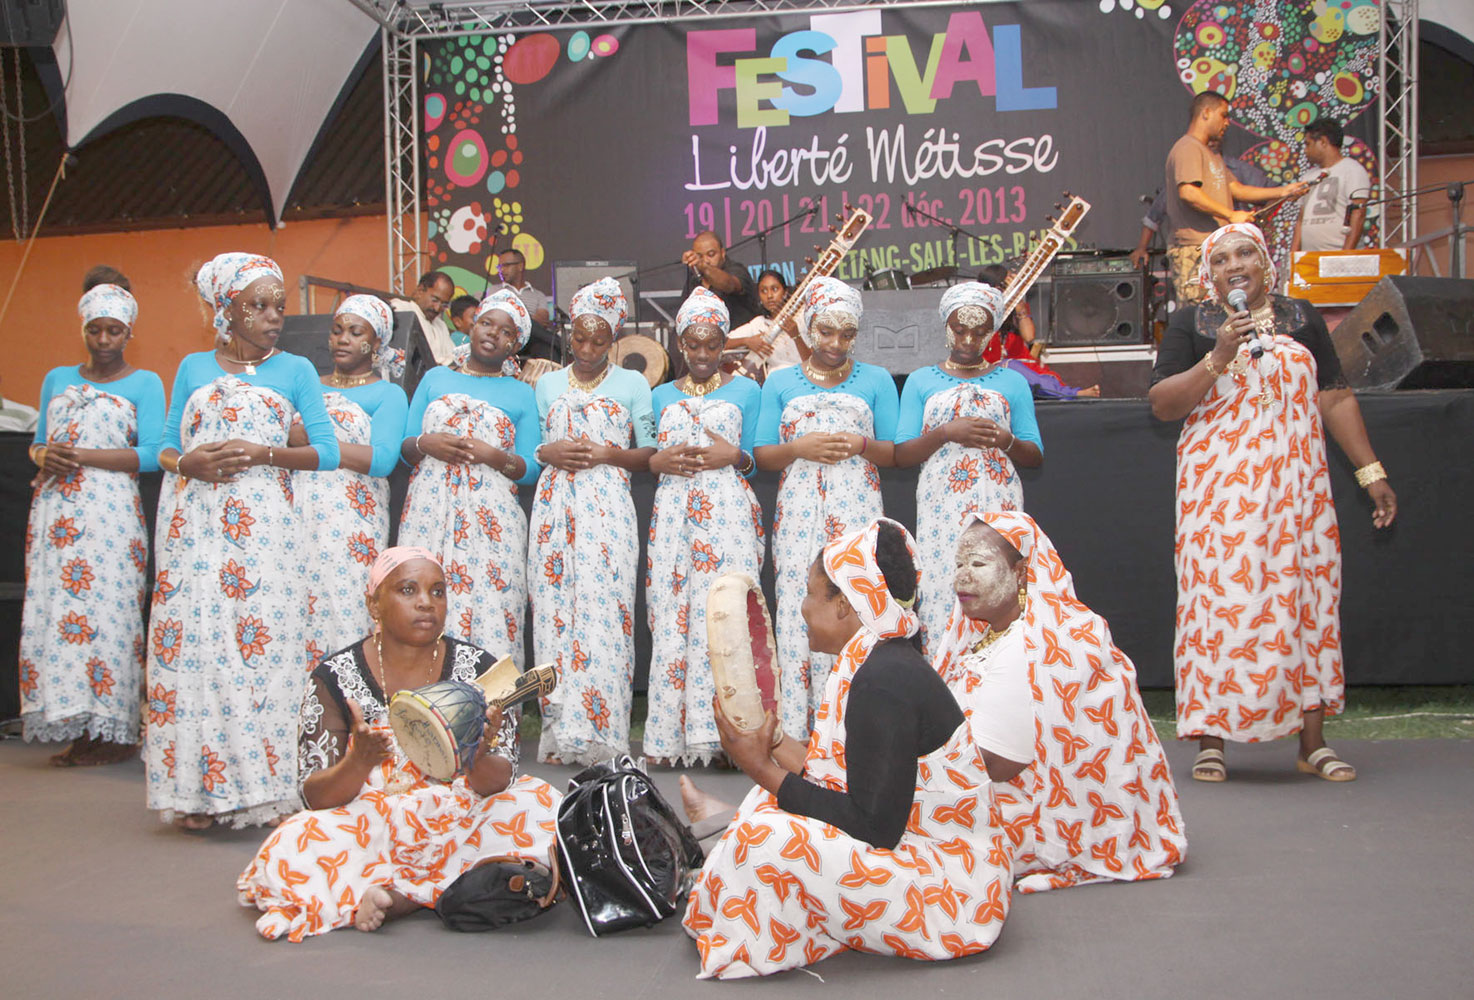 Festival Liberté Métisse